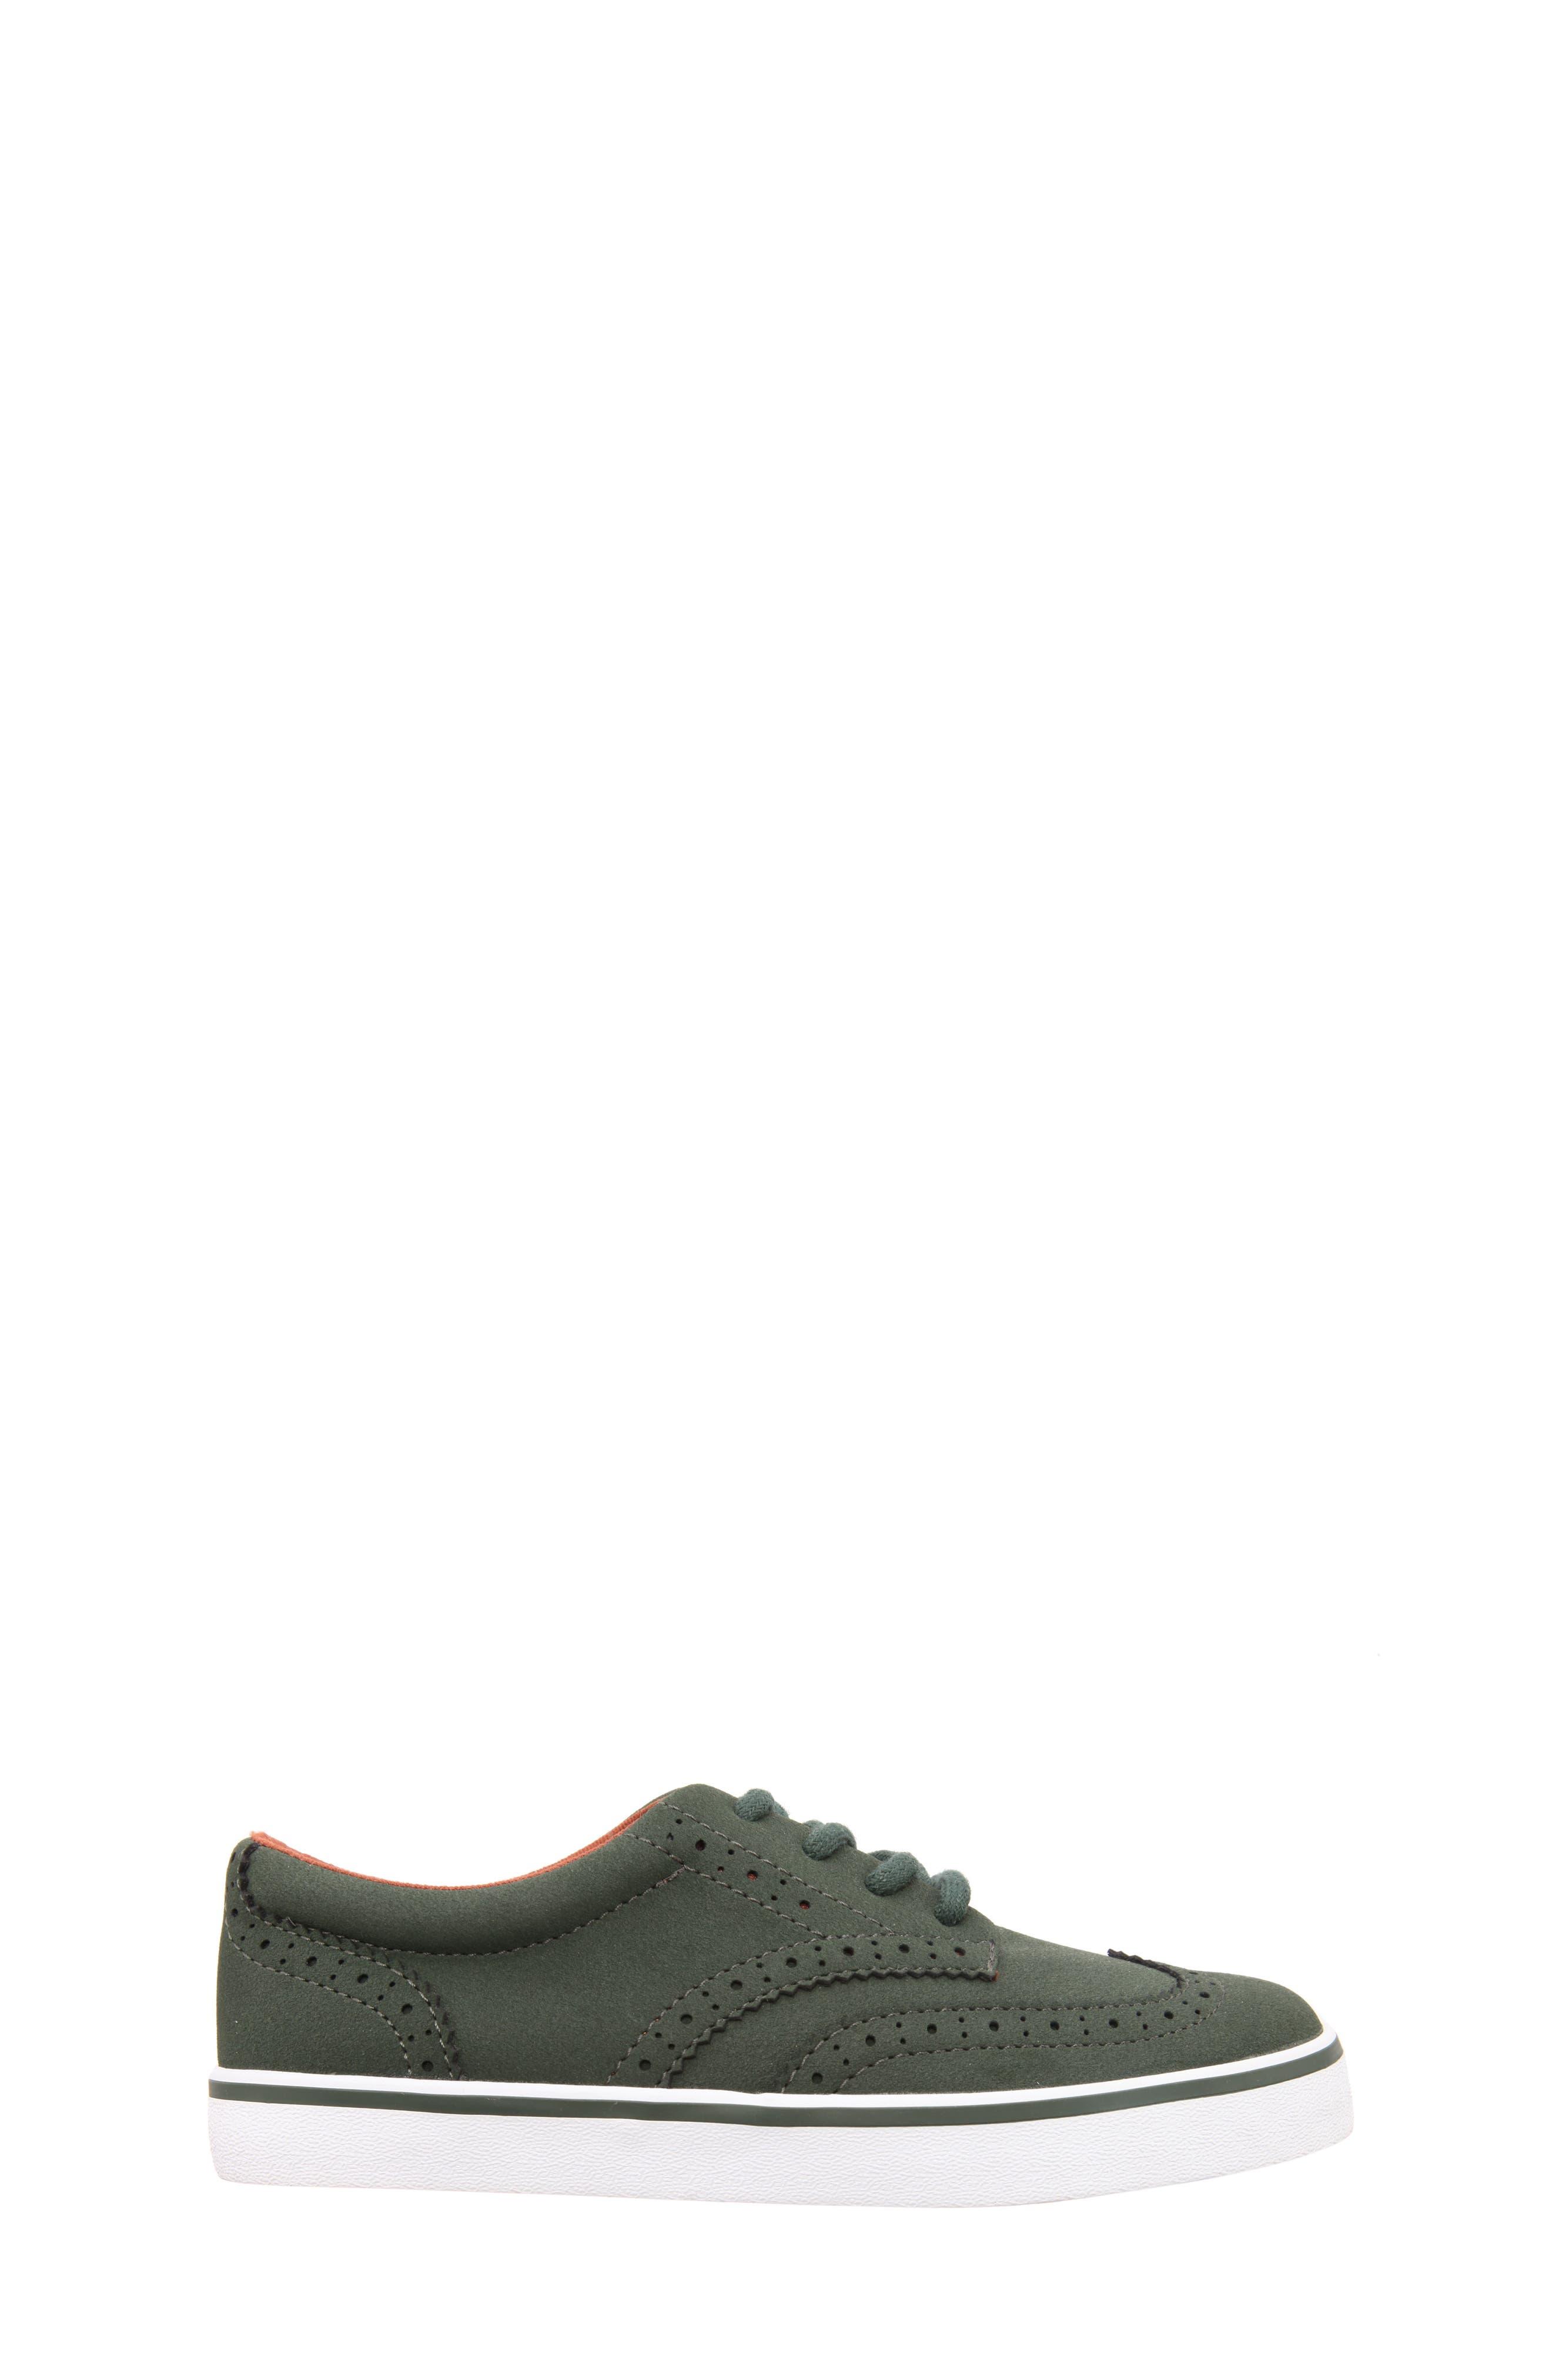 Wingtip Sneaker,                             Alternate thumbnail 3, color,                             Olive Faux Suede